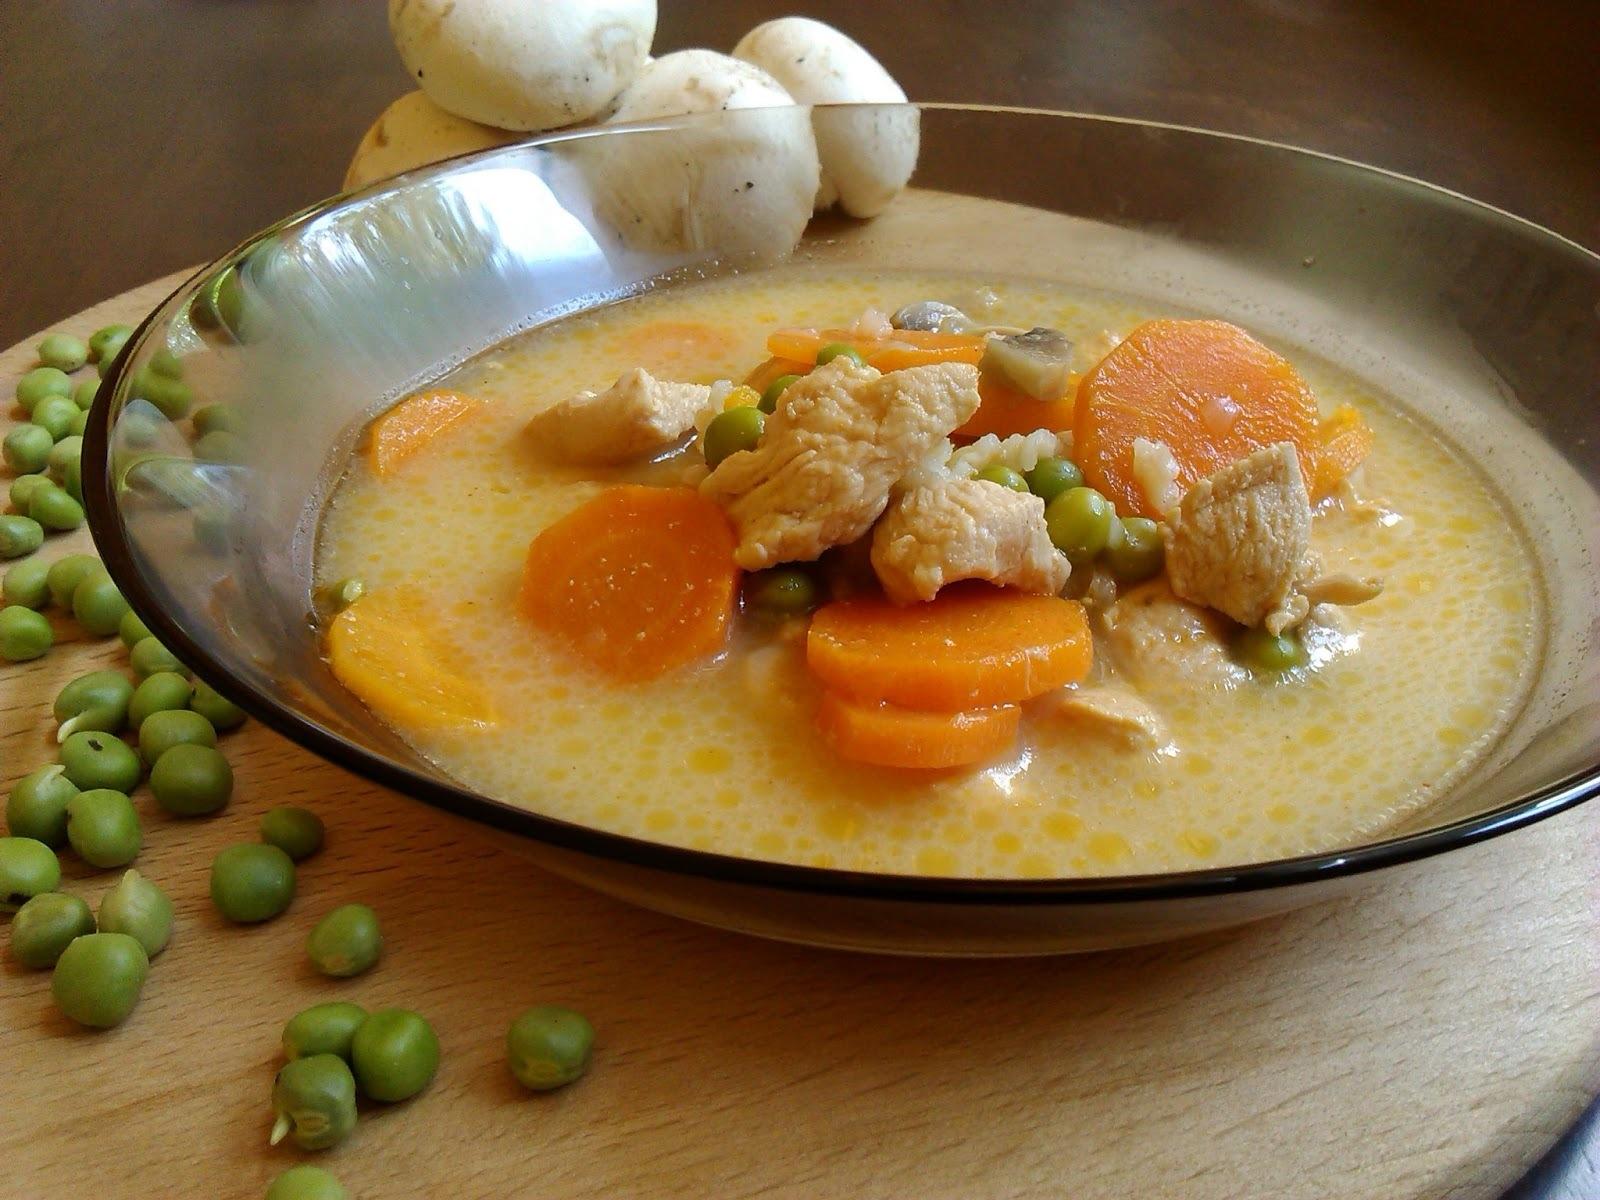 Csorba csirkével (Ciorba de pui)